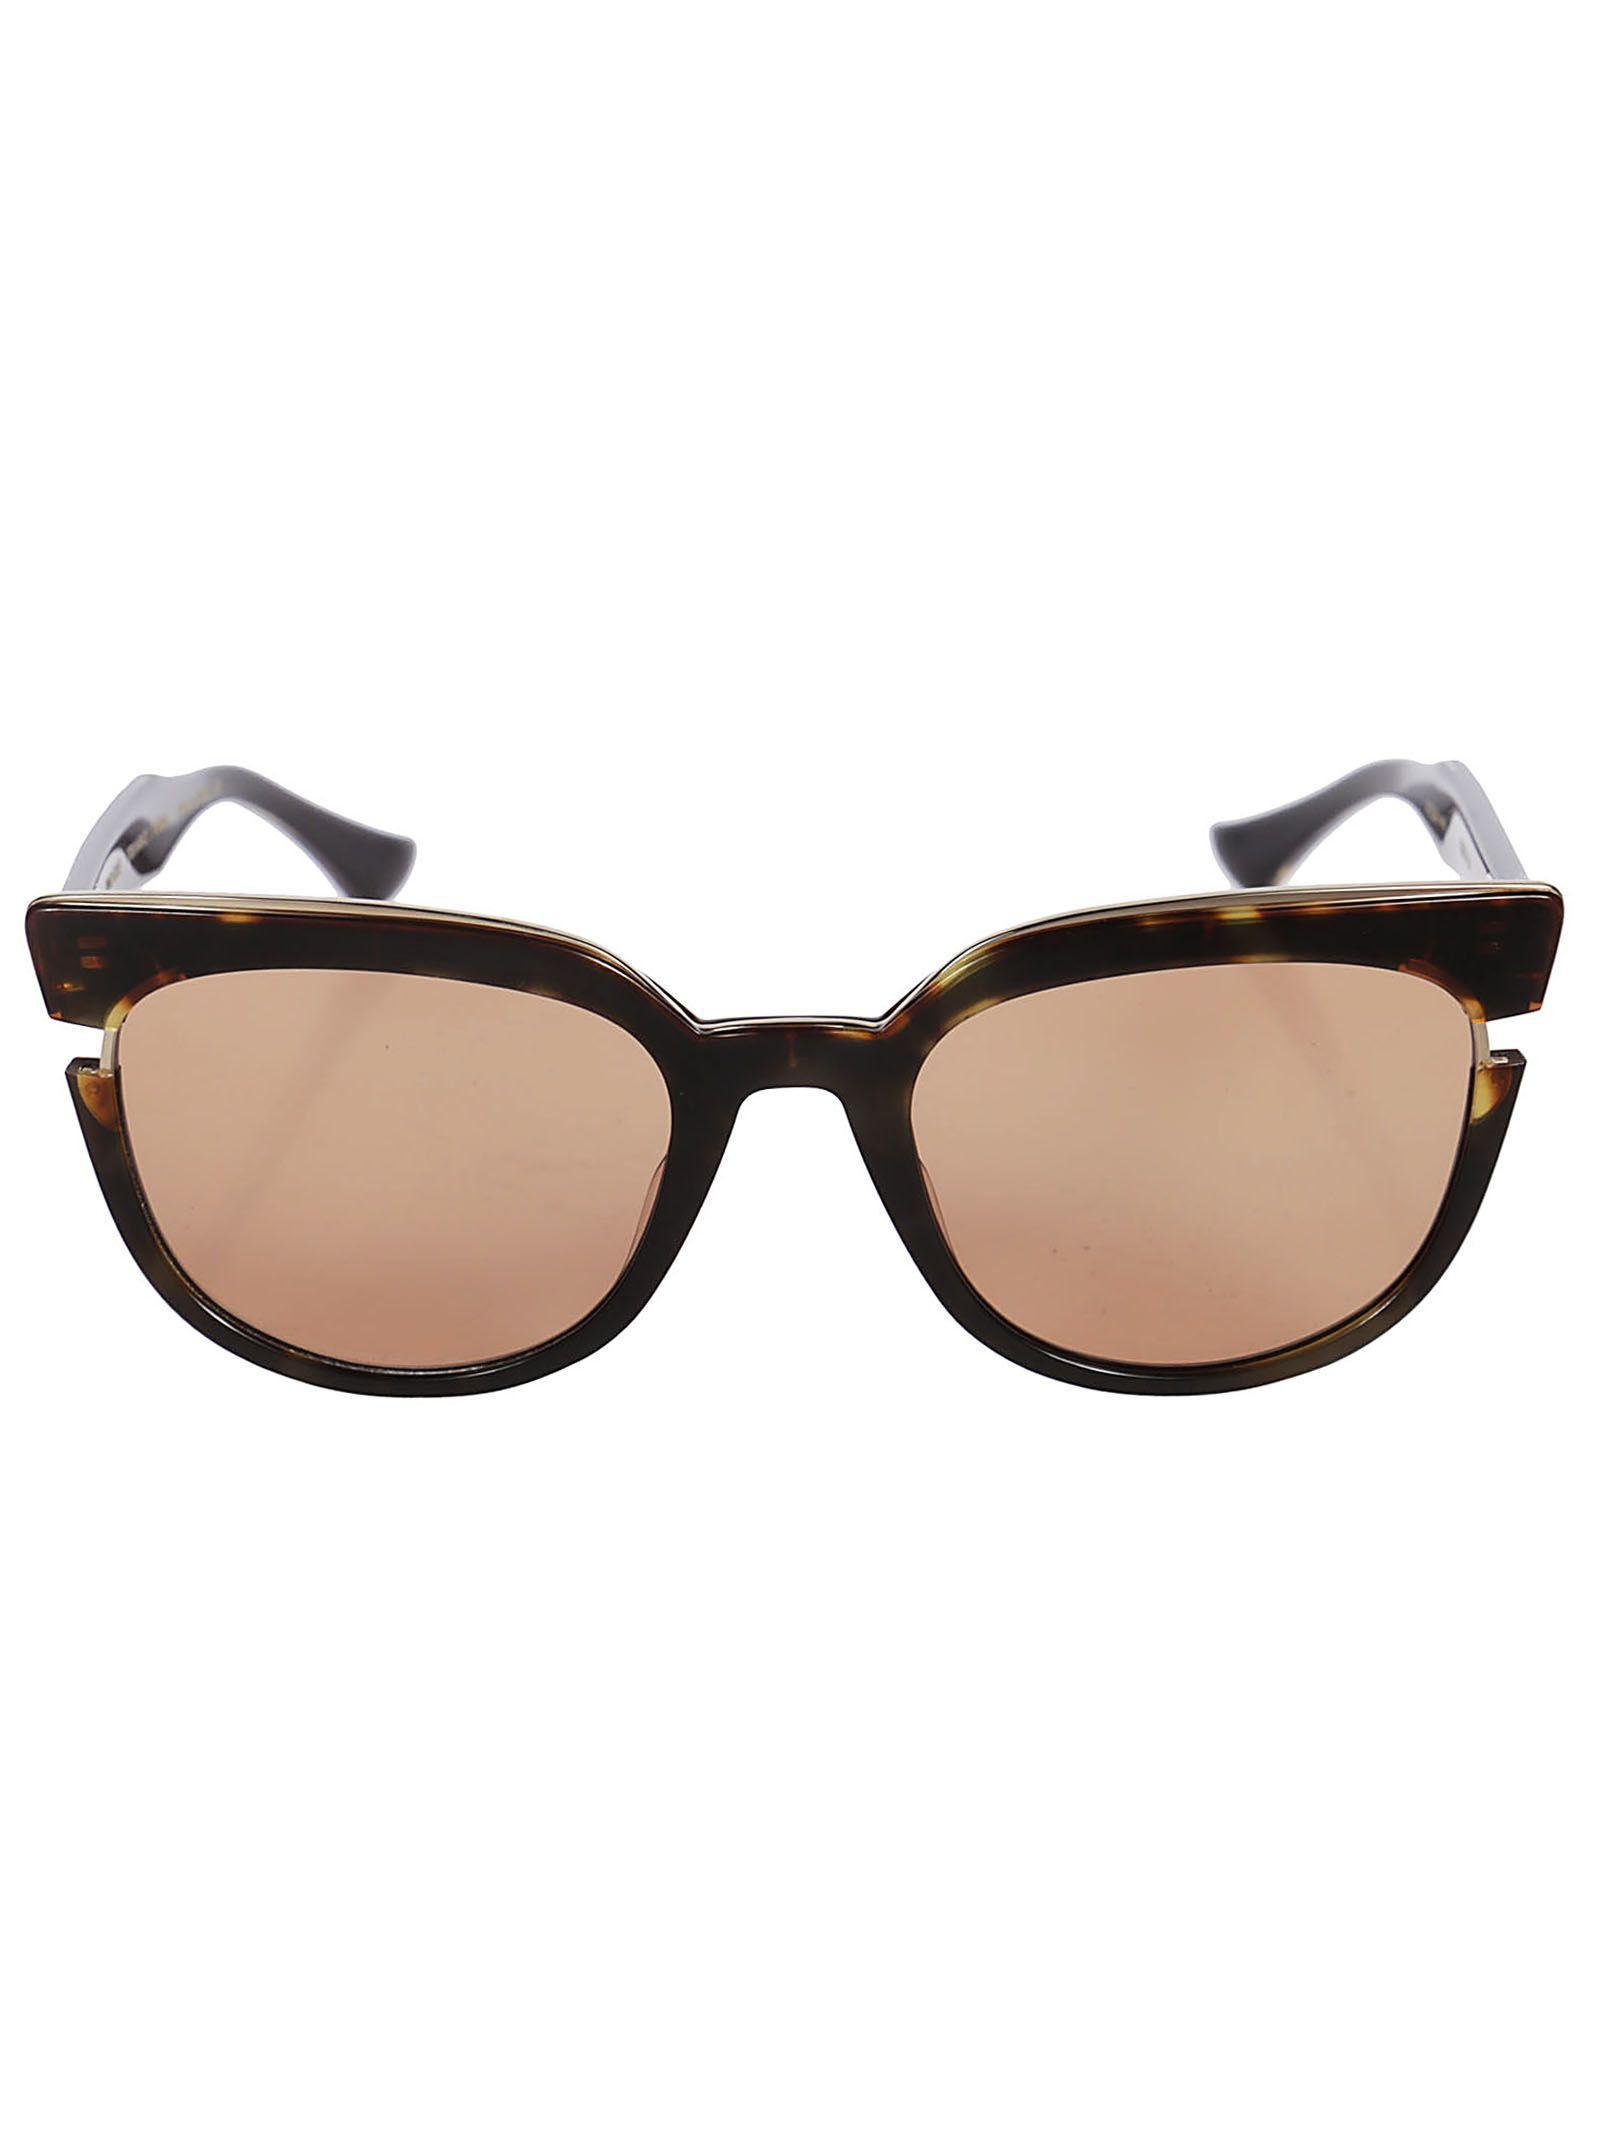 71bc19f3d507 Dita Cat Eye Sunglasses In Dark Tortoise